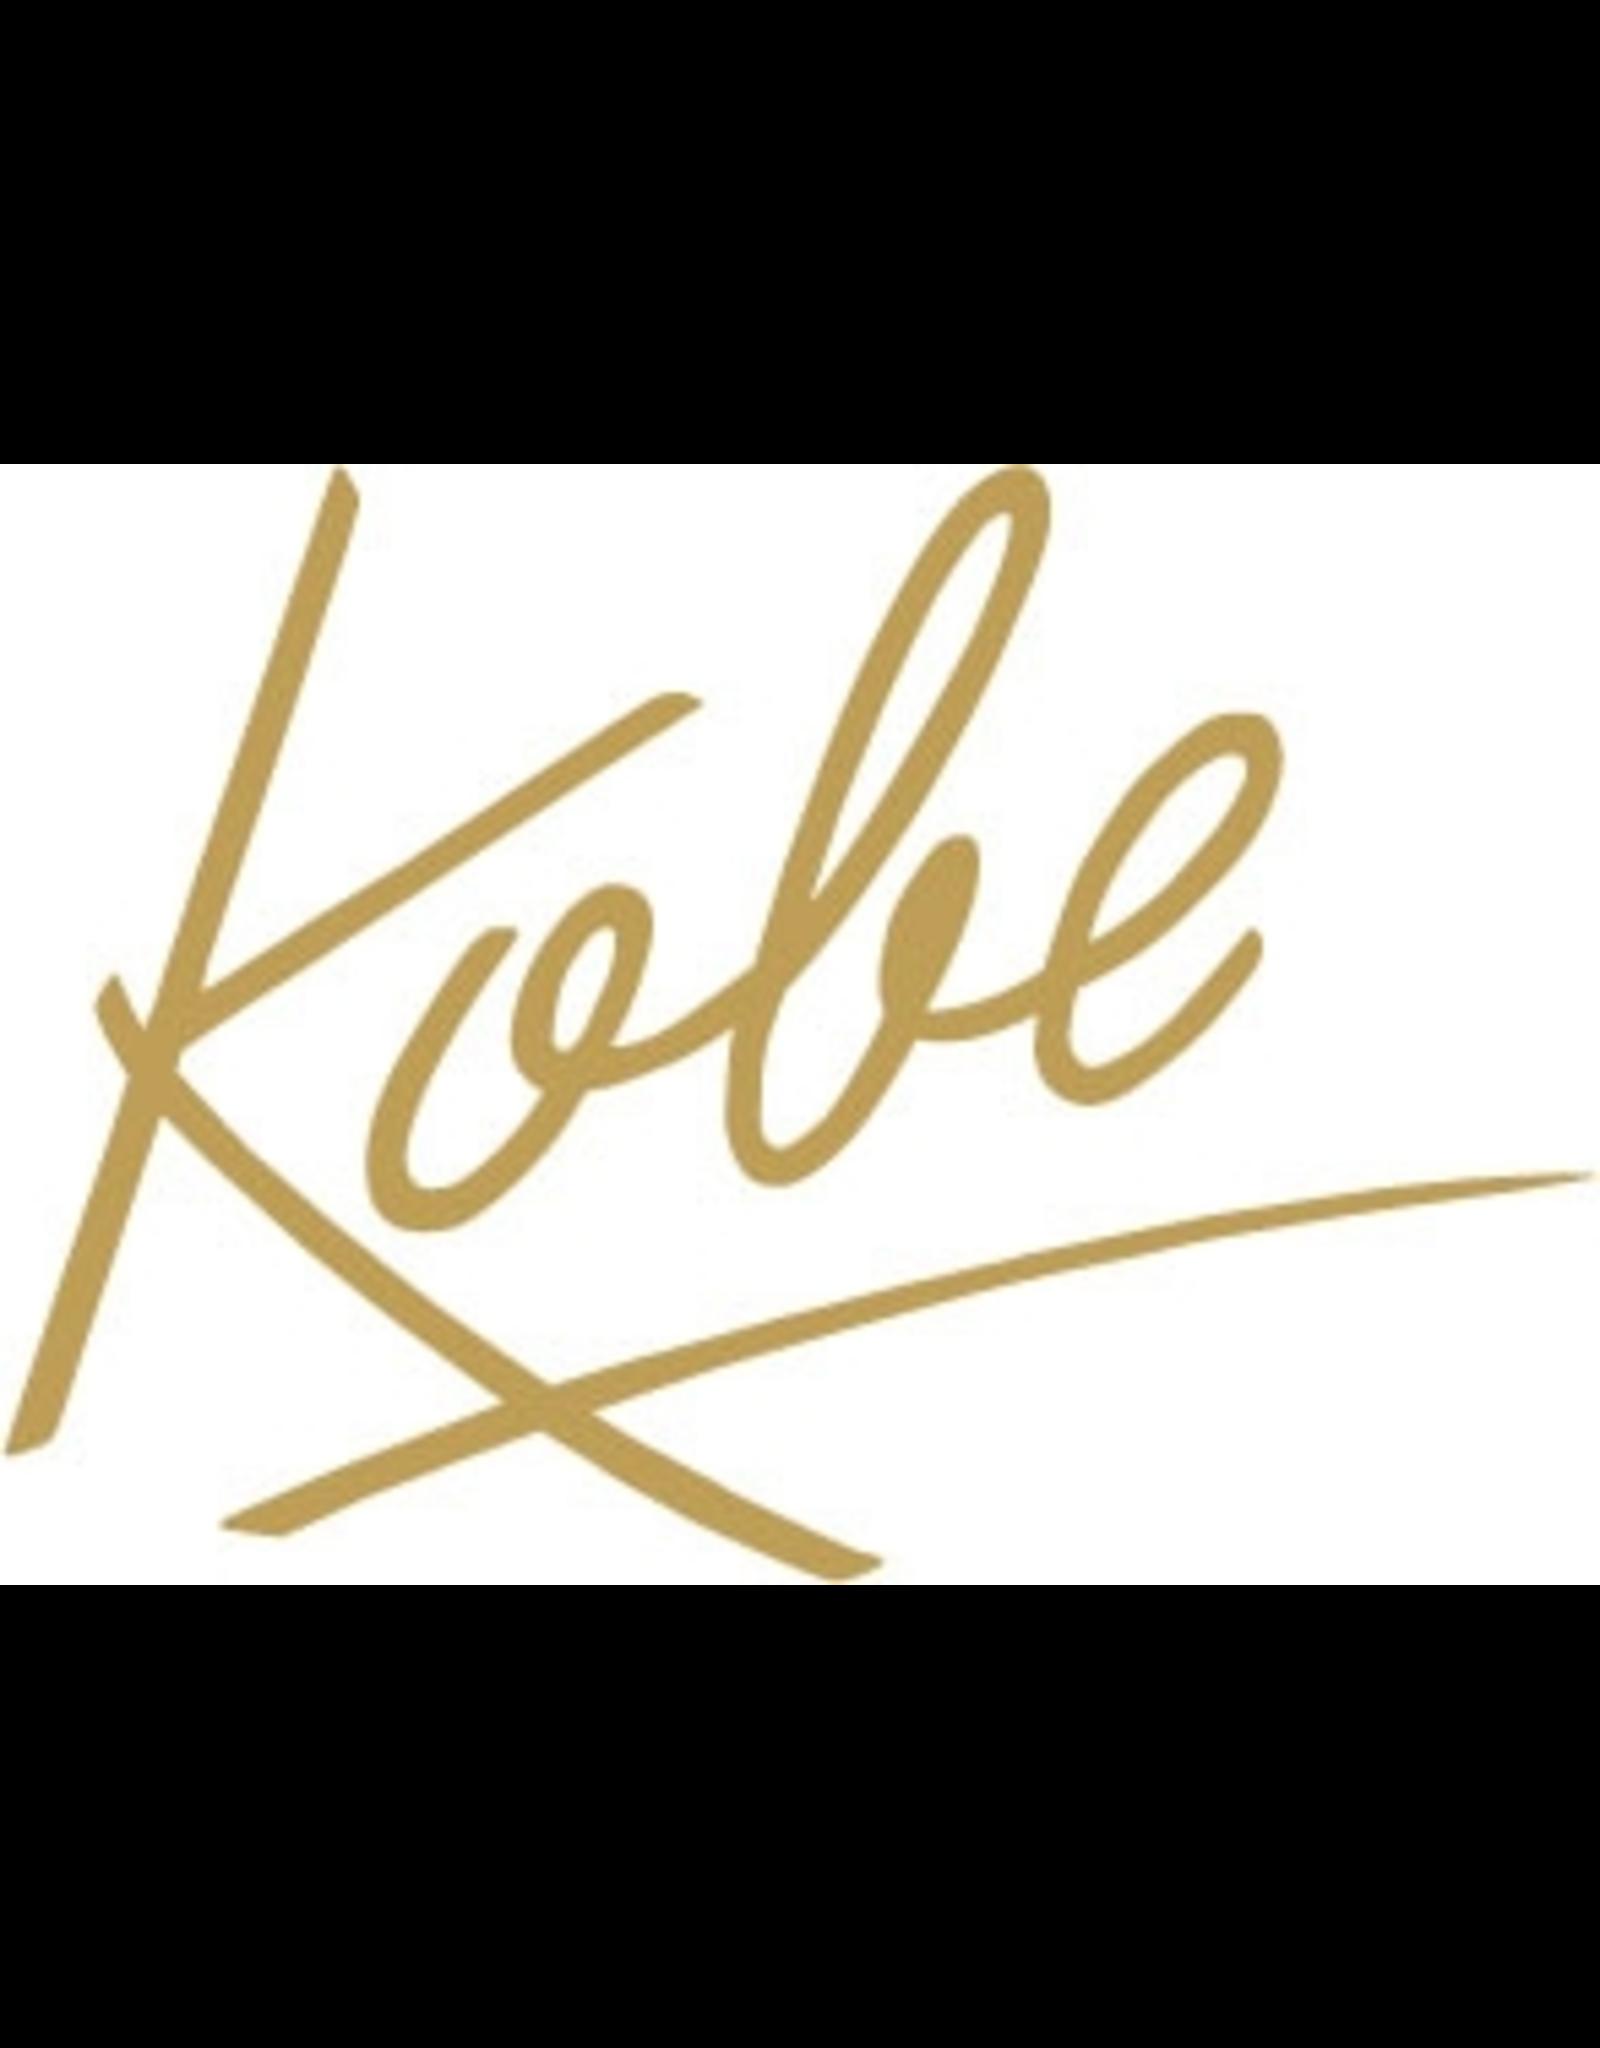 Kobe Kobe